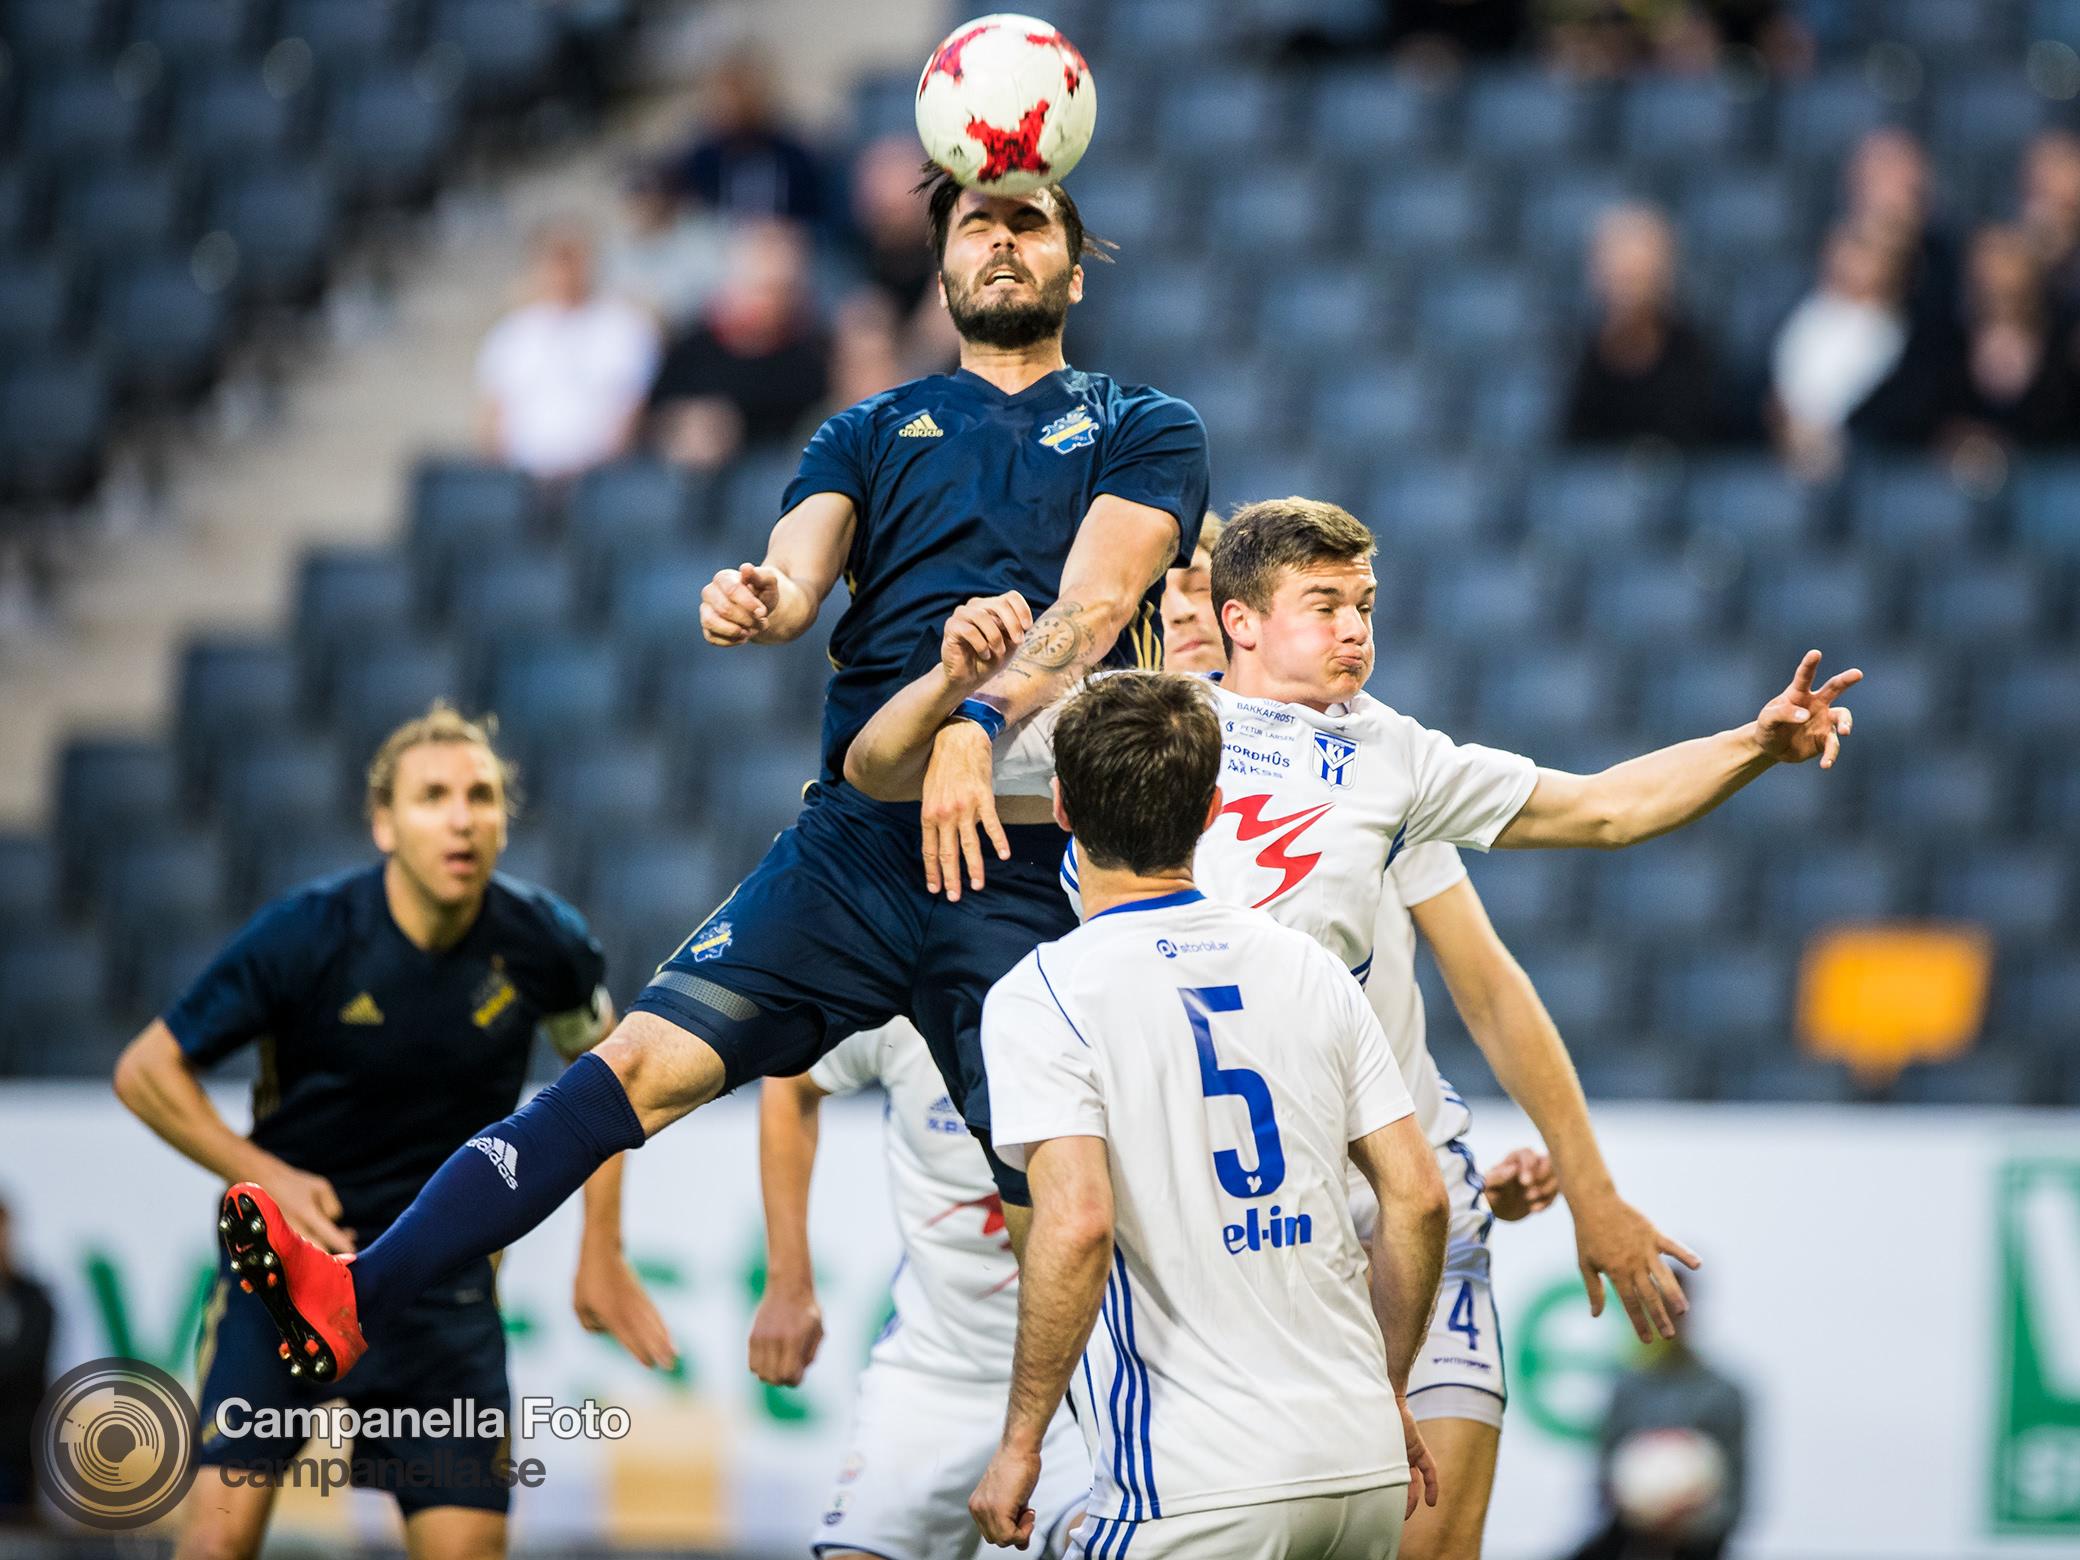 AIK crushes KÍ Klaksvík in Europa League qualification match